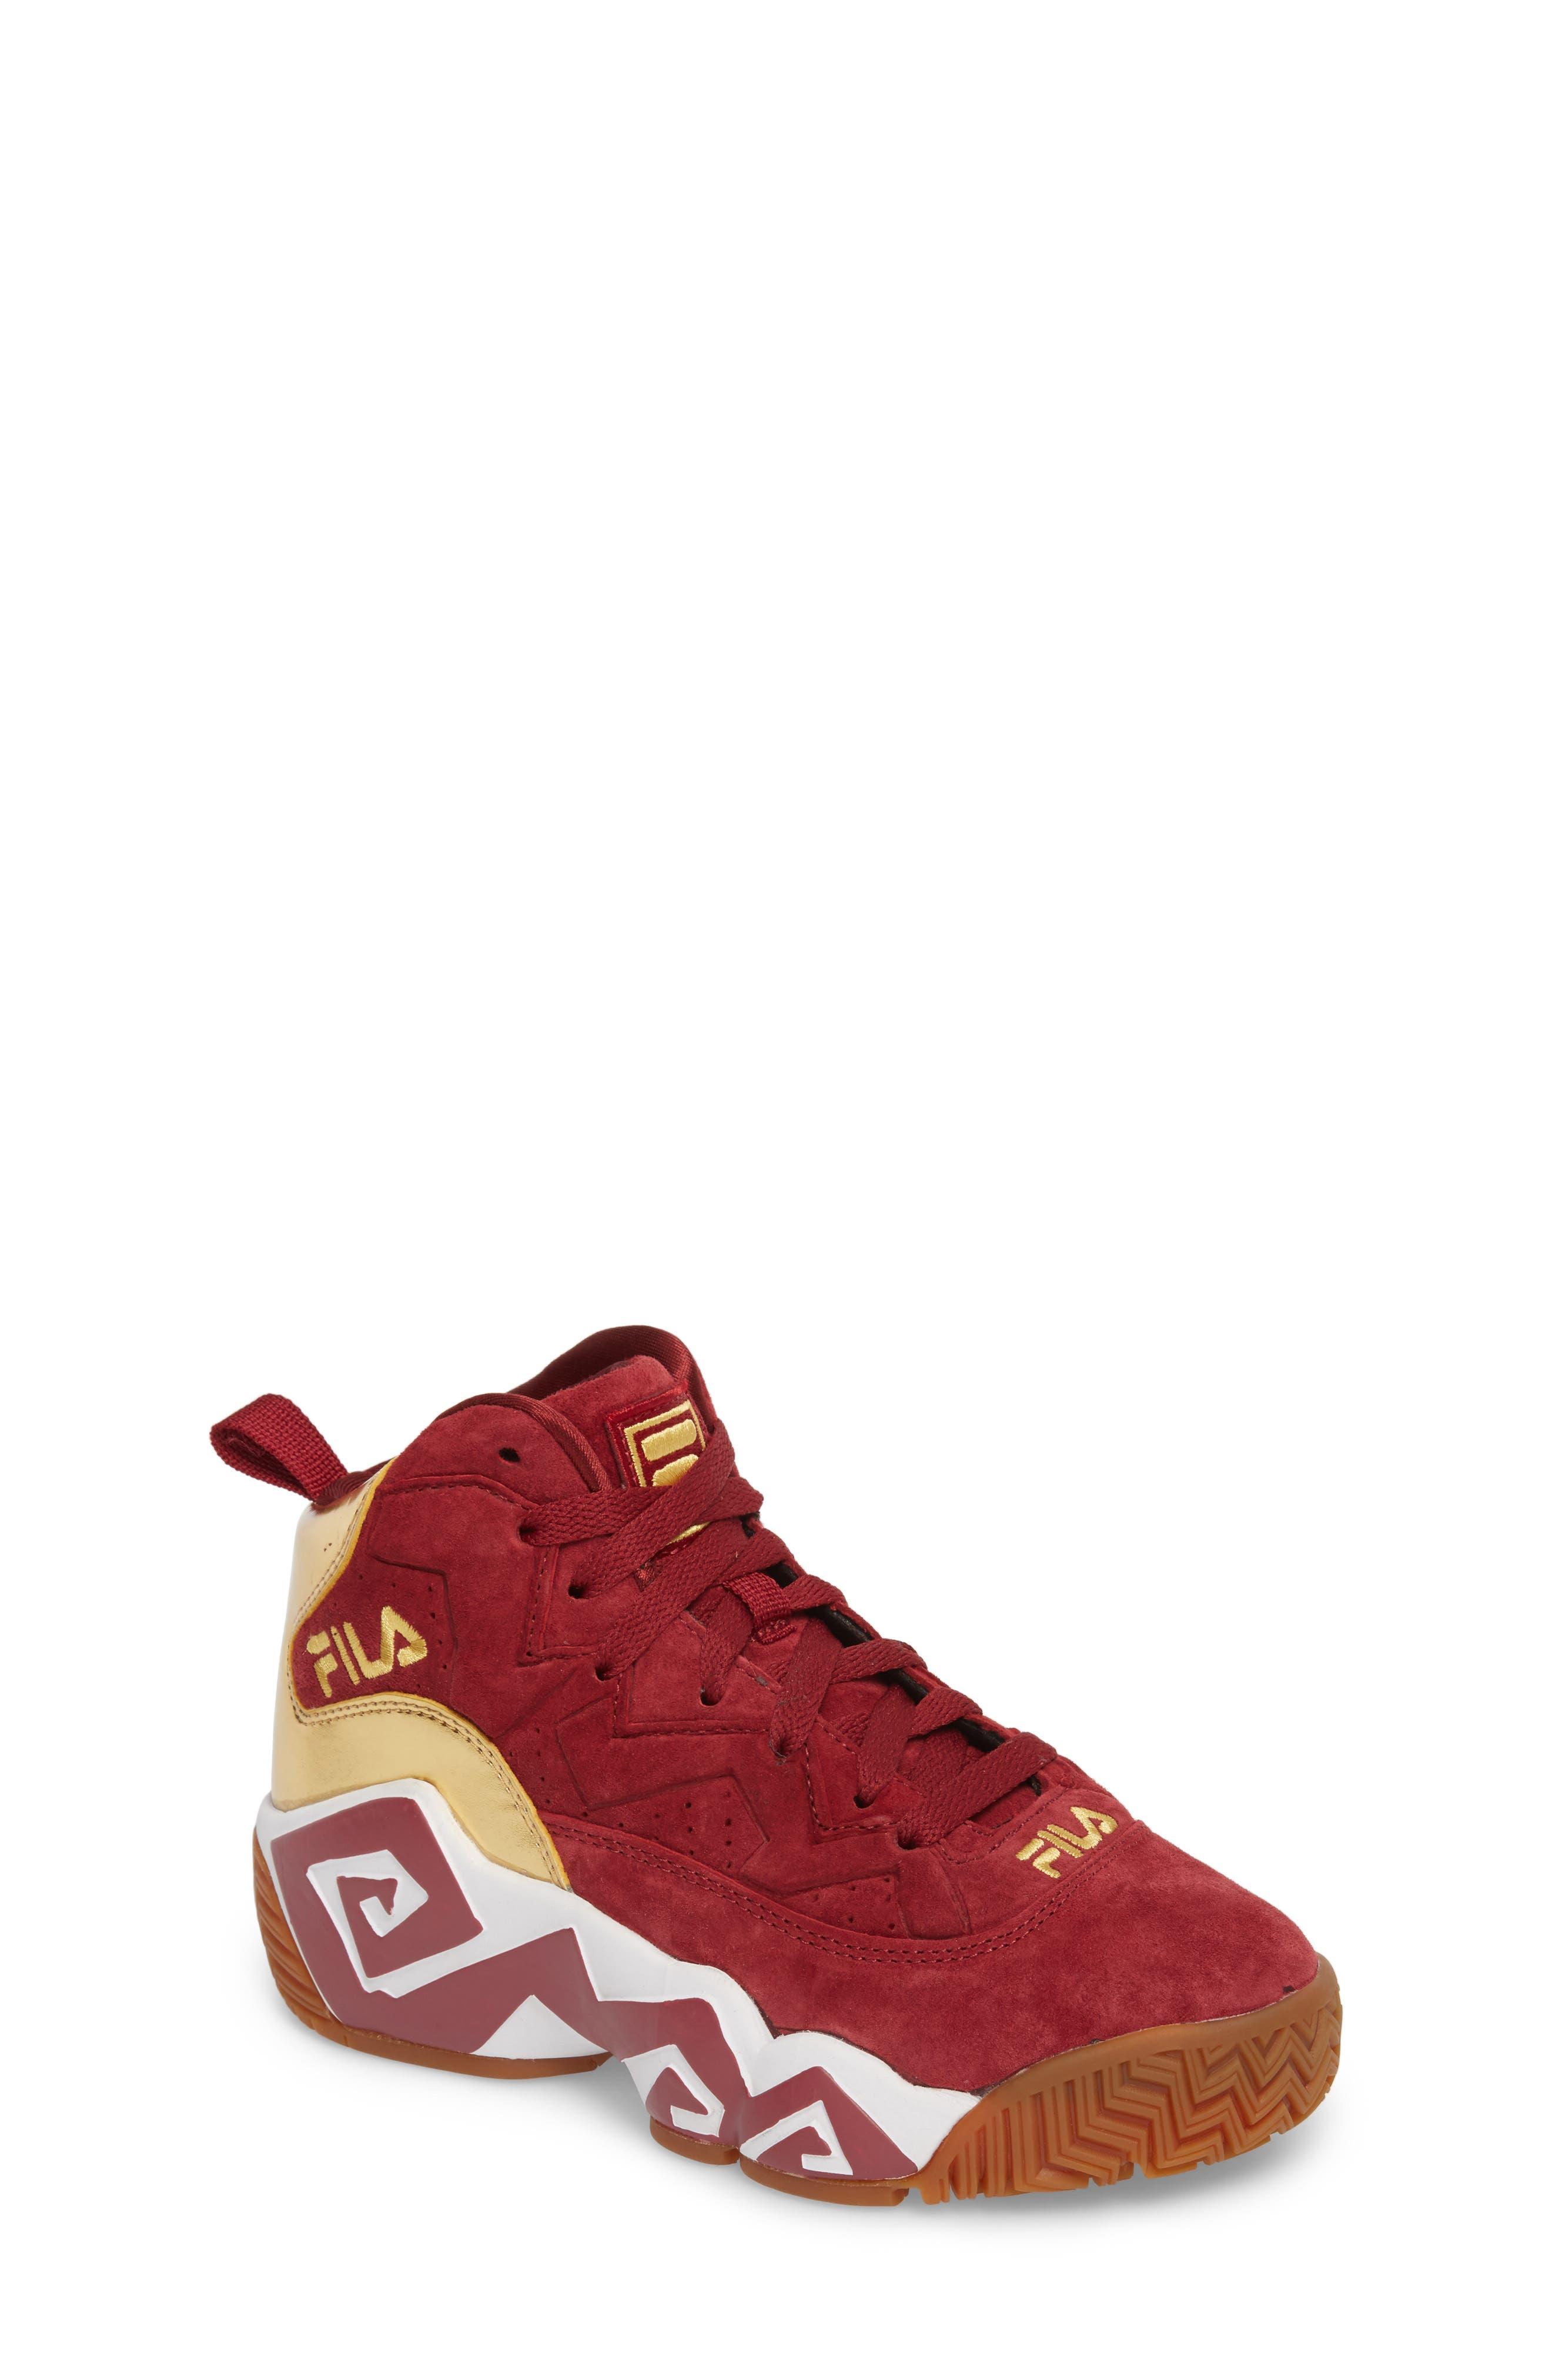 Main Image - FILA Heritage Sneaker (Big Kid)